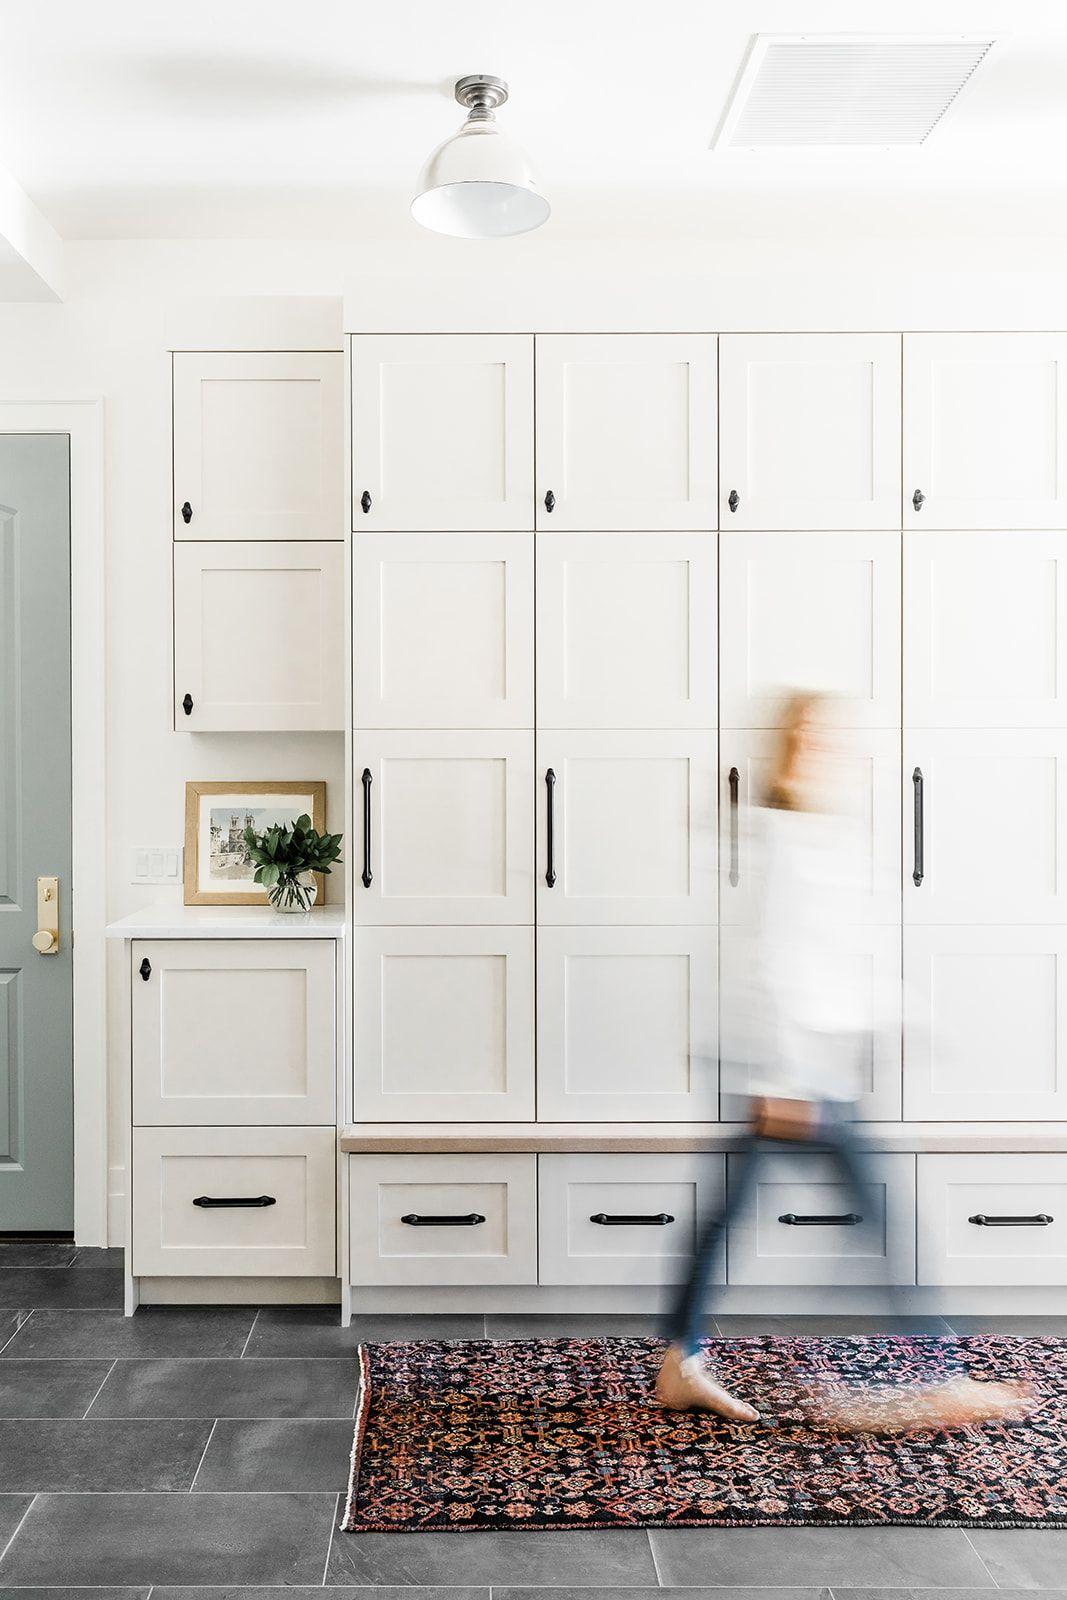 White Mud Room Built Ins Vintage Rug Slate Tile Floors Black Hardware Subtle Mud Room Natural Wood Elements Hausrenovierung Haus Interieurs Eingebaut